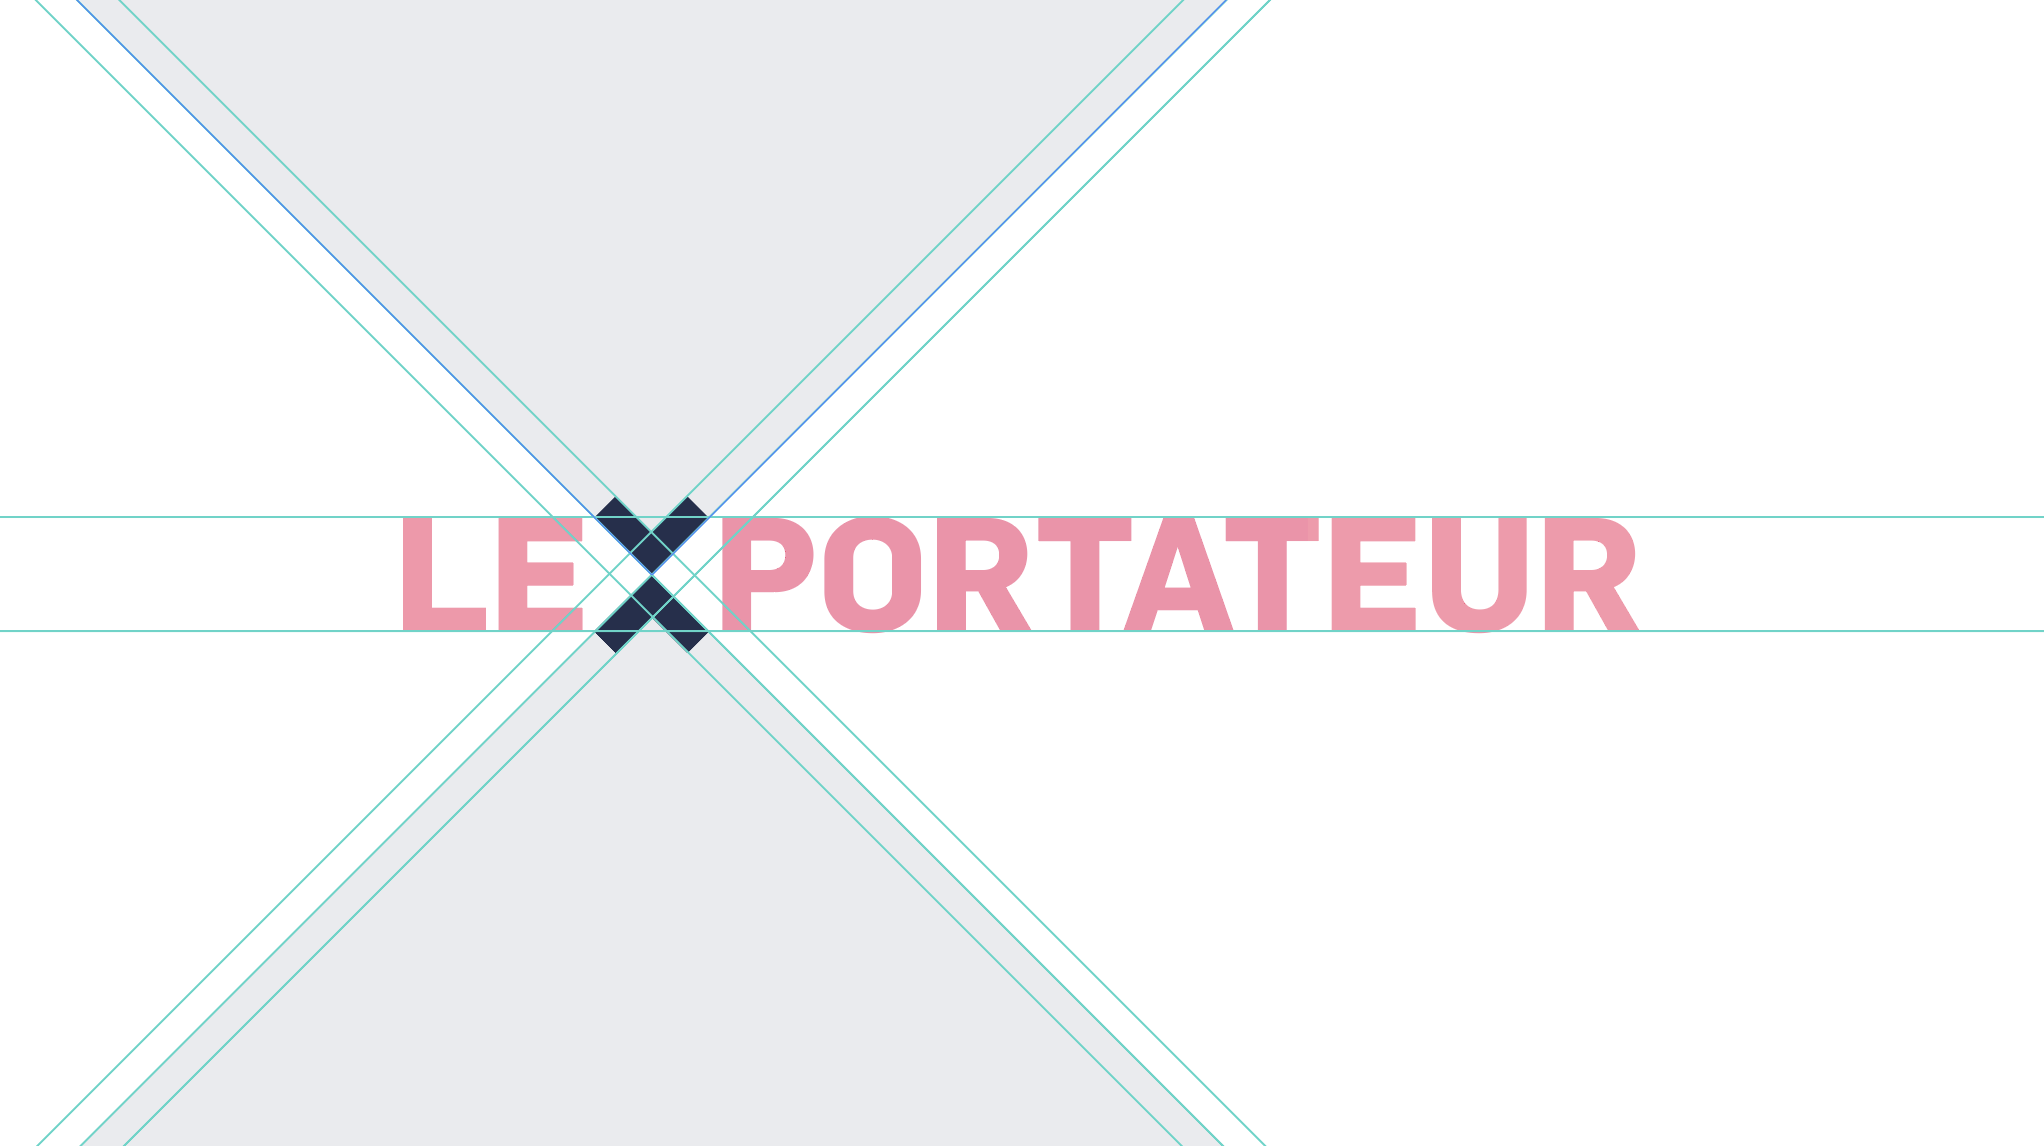 lexportateur-logo-x